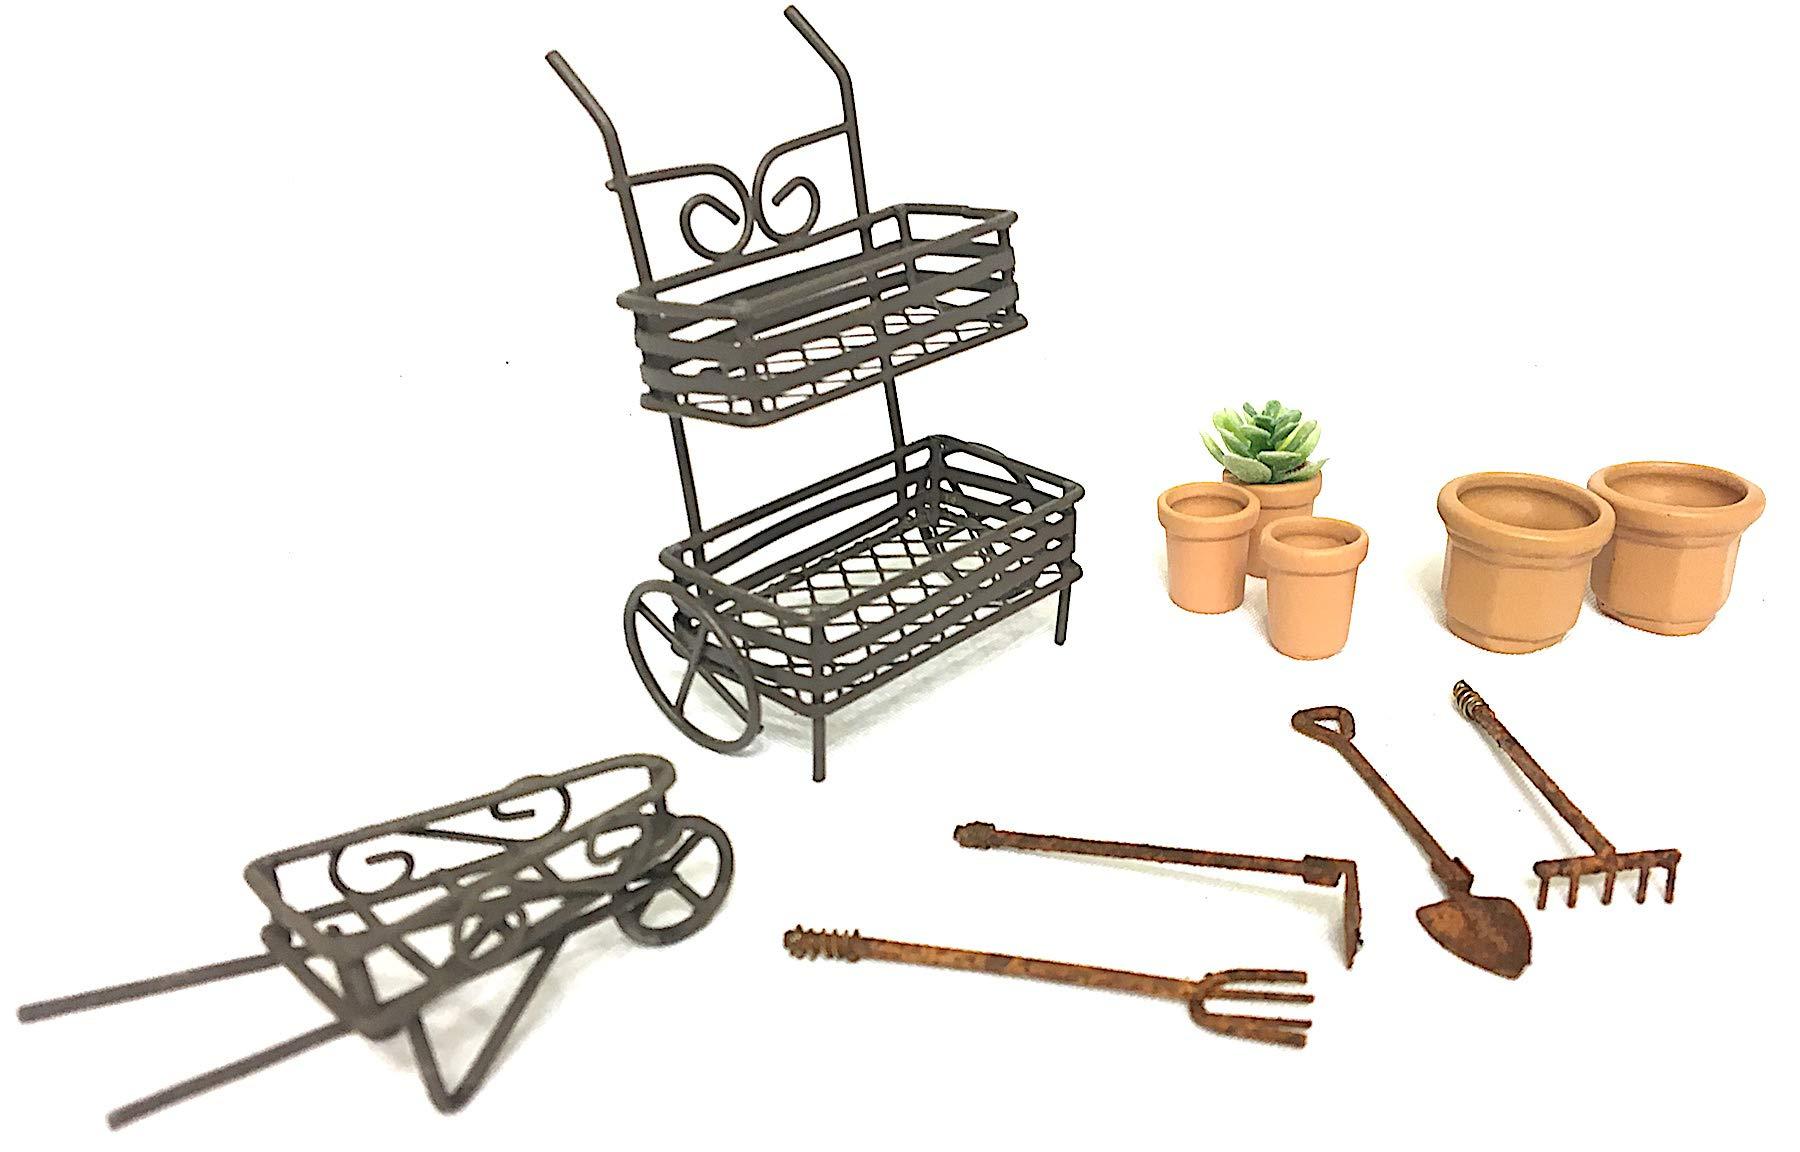 Pabu Guli DIY Fairy Garden Kit, with Miniature Rustic Plant Cart, Wheel Barrow and Accessories